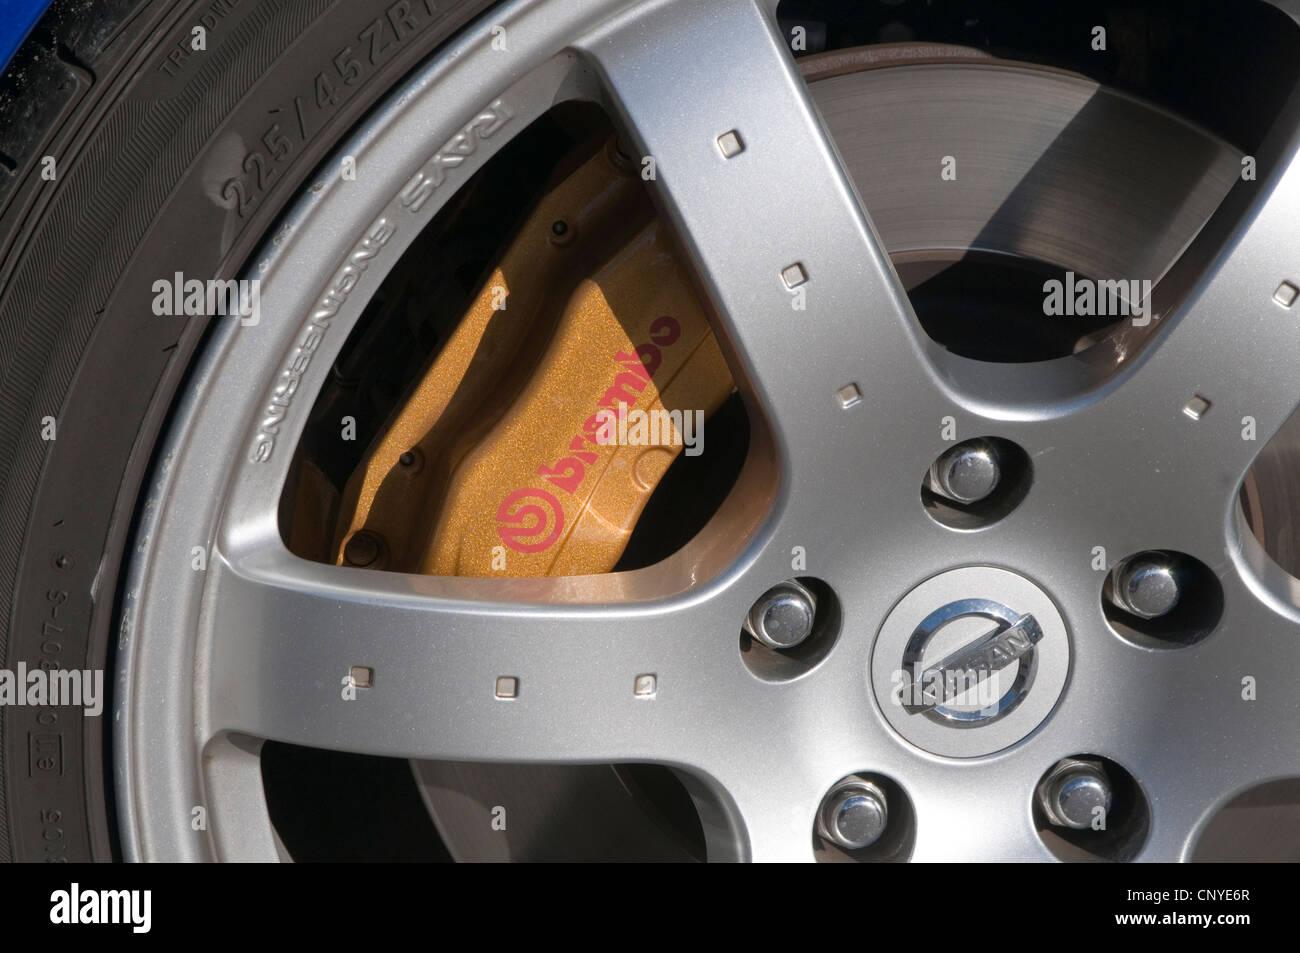 Brembo Brake Brakes Calipers Caliper Italian Performance Car Parts